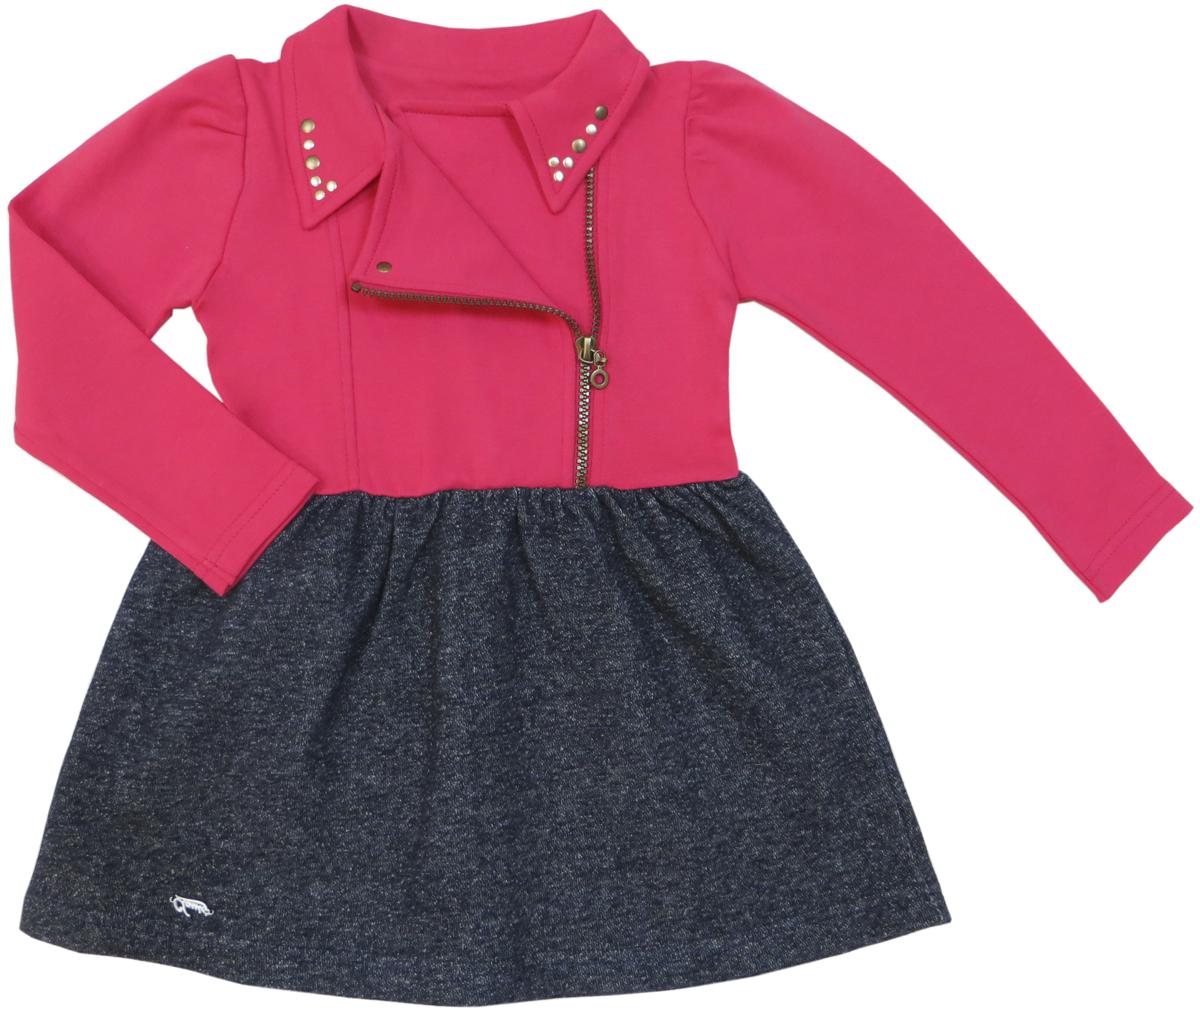 Платье для девочки Soni Kids Прогулка с Мими, цвет: розовый, синий. З7105010. Размер 122